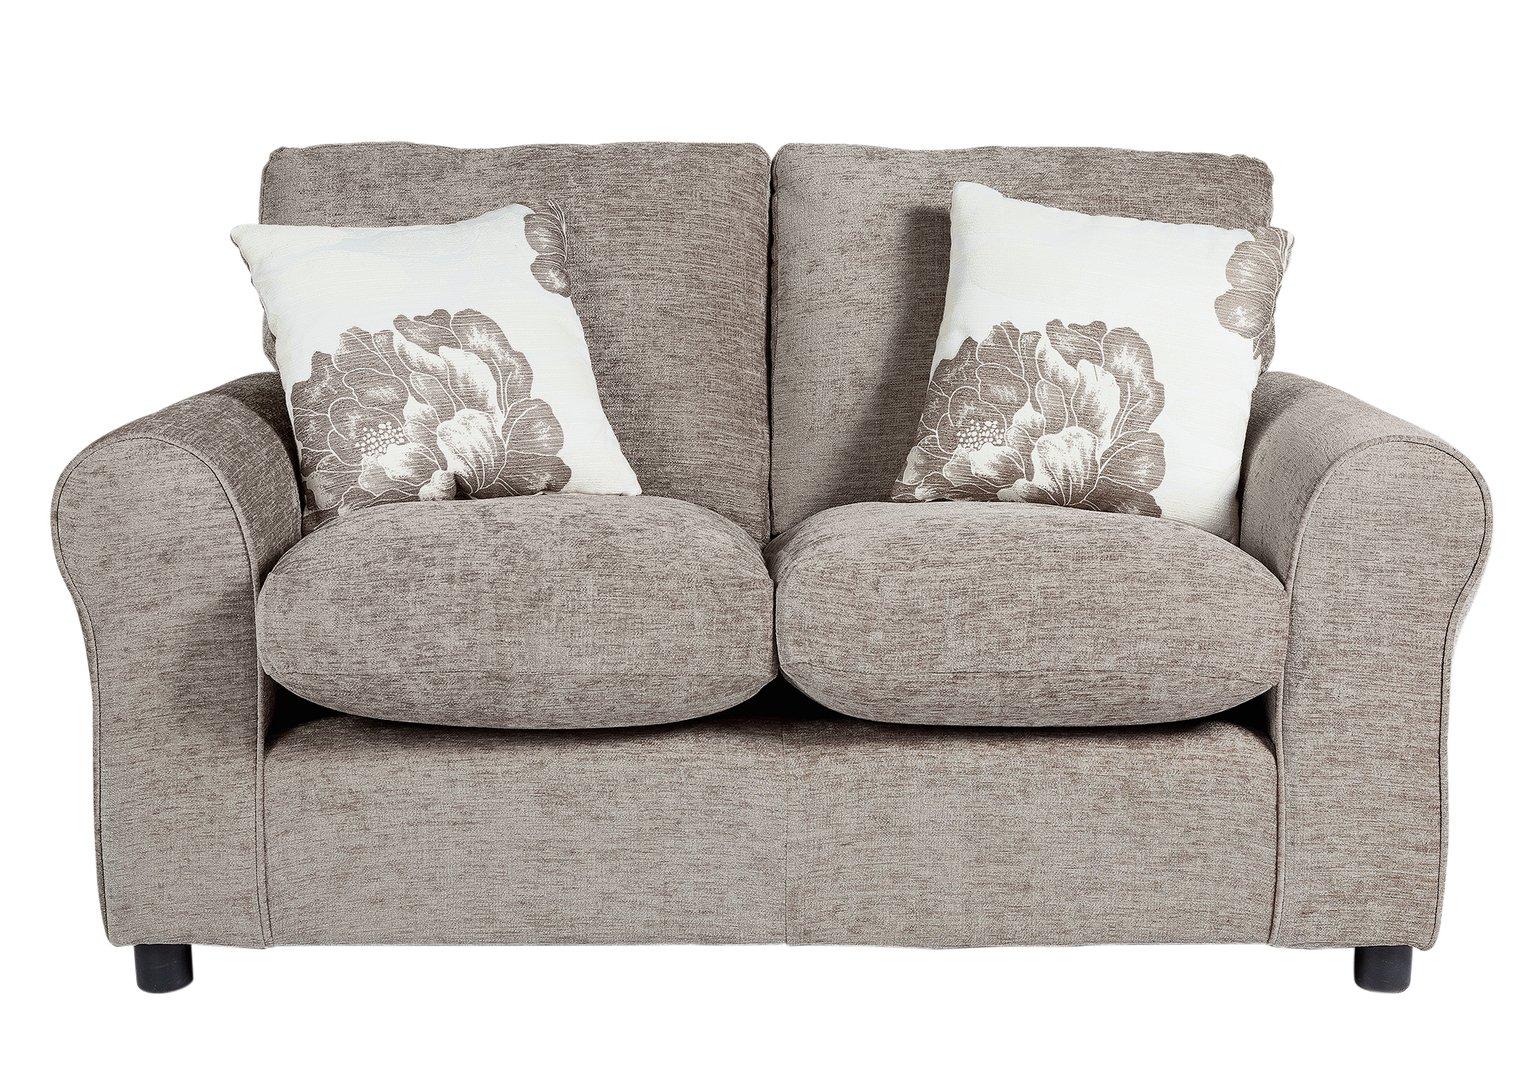 sale on home tessa compact 2 seater fabric sofa mink. Black Bedroom Furniture Sets. Home Design Ideas